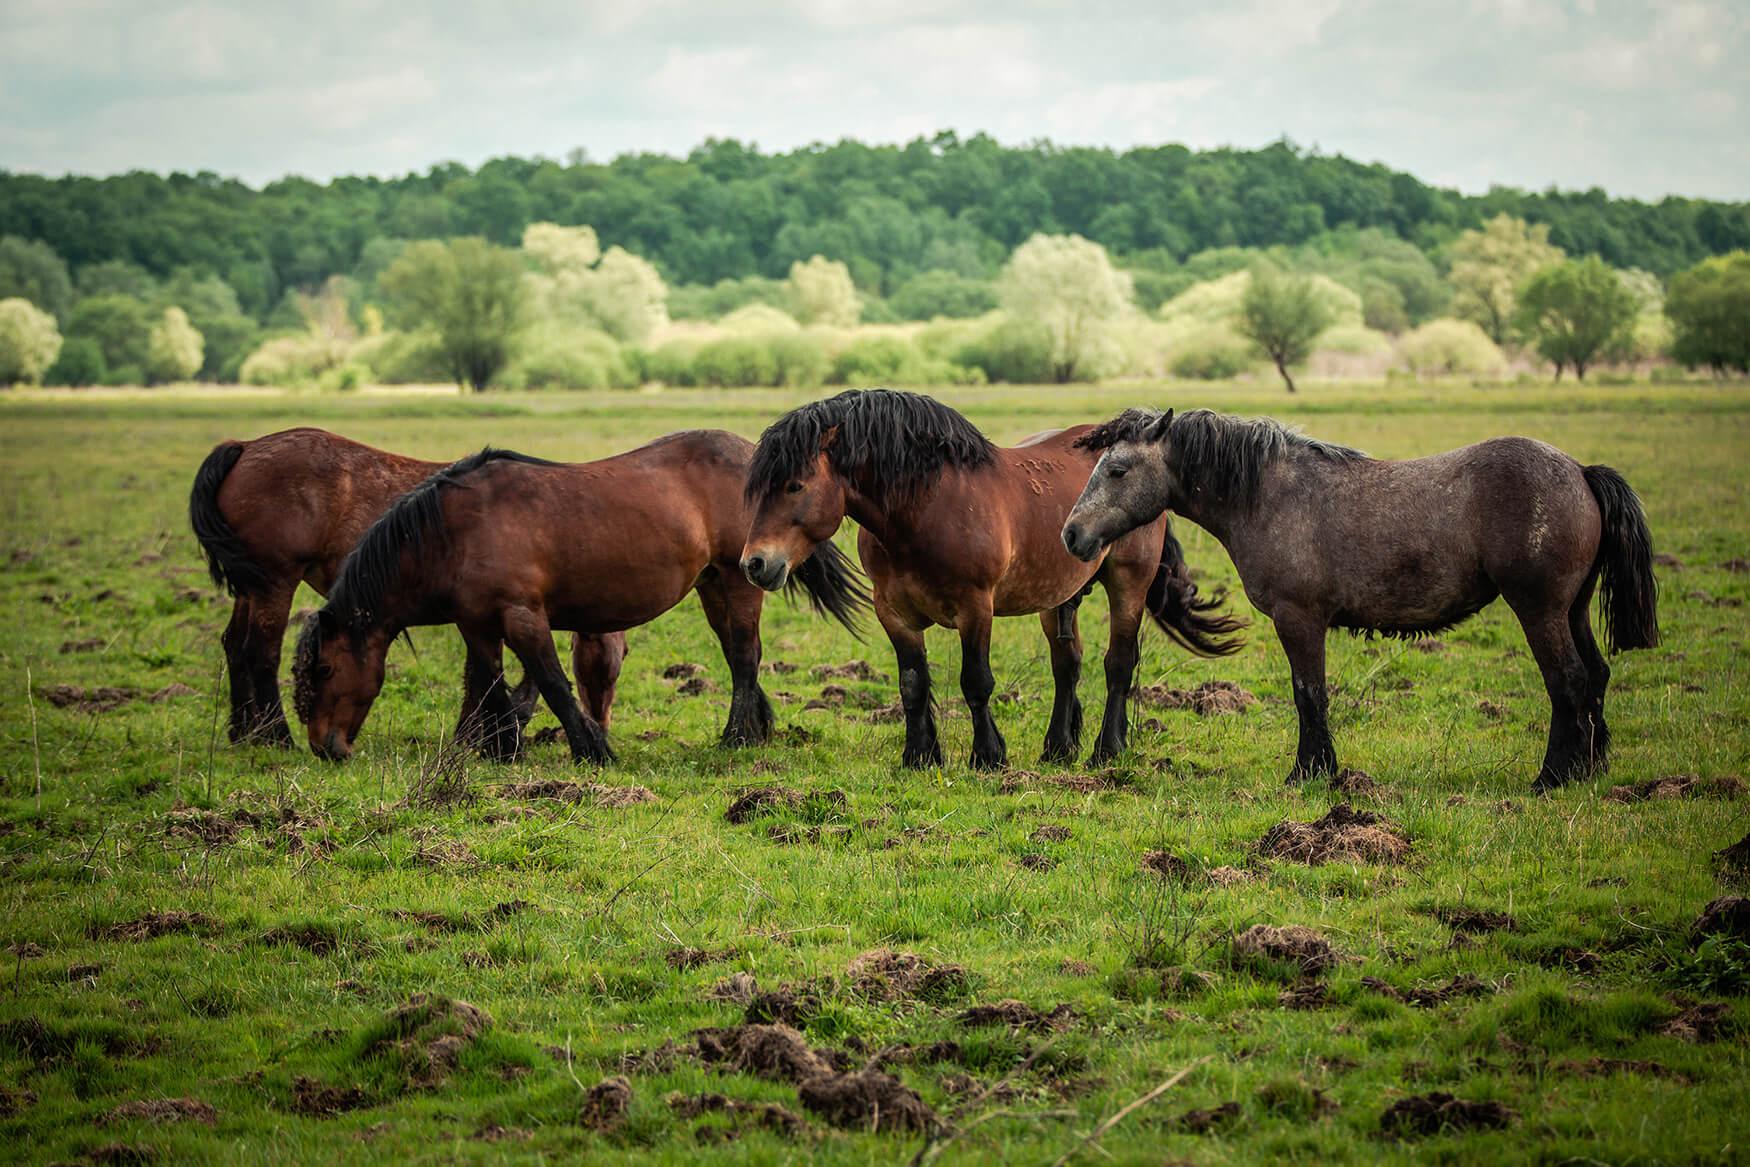 Damir_Pahić_Mužilovčica_Horses